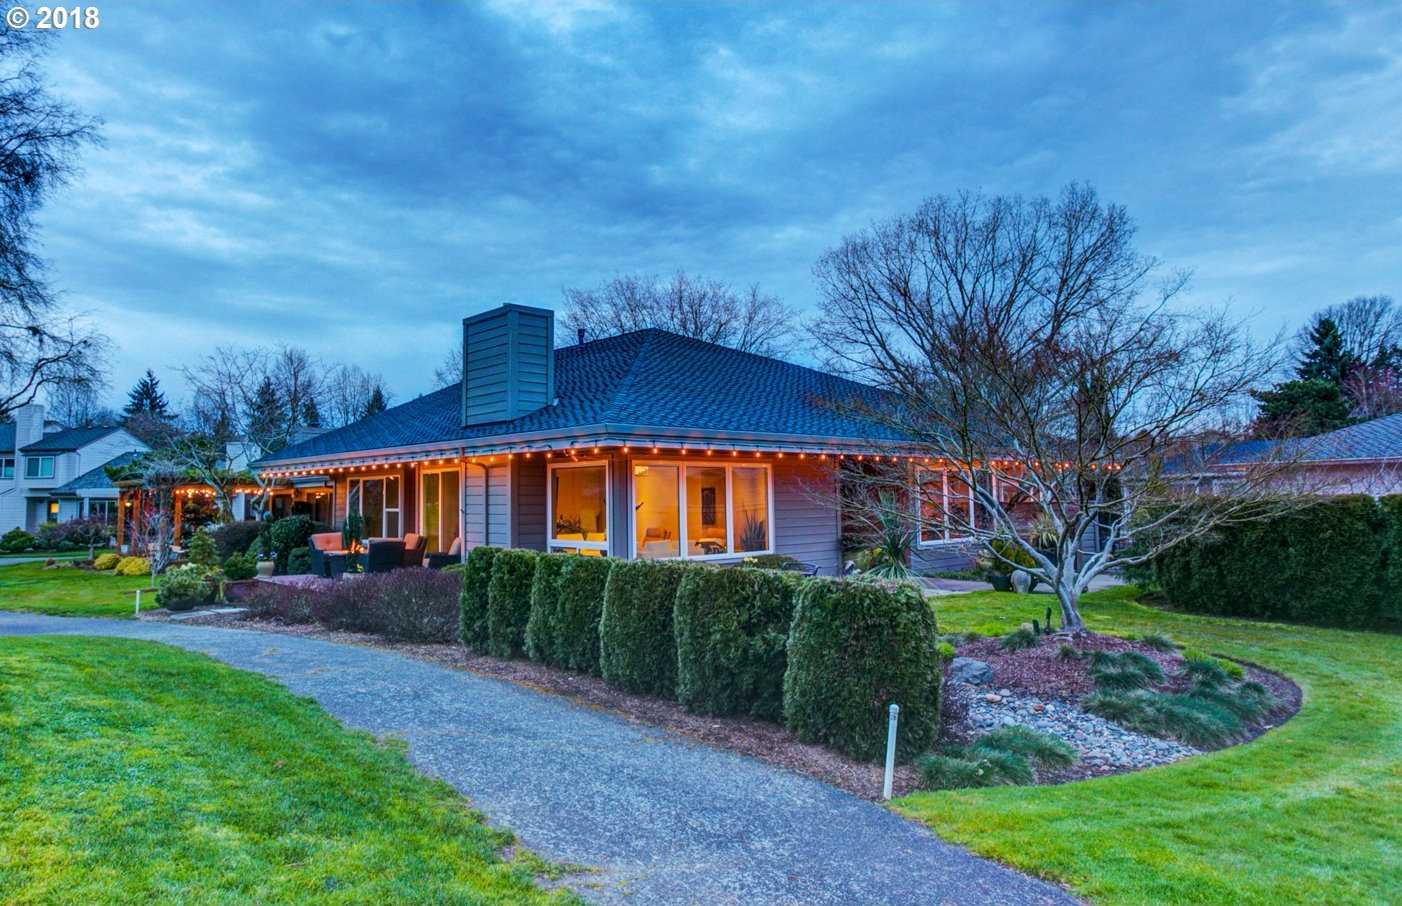 $689,000 - 3Br/3Ba -  for Sale in Charbonneau, Wilsonville